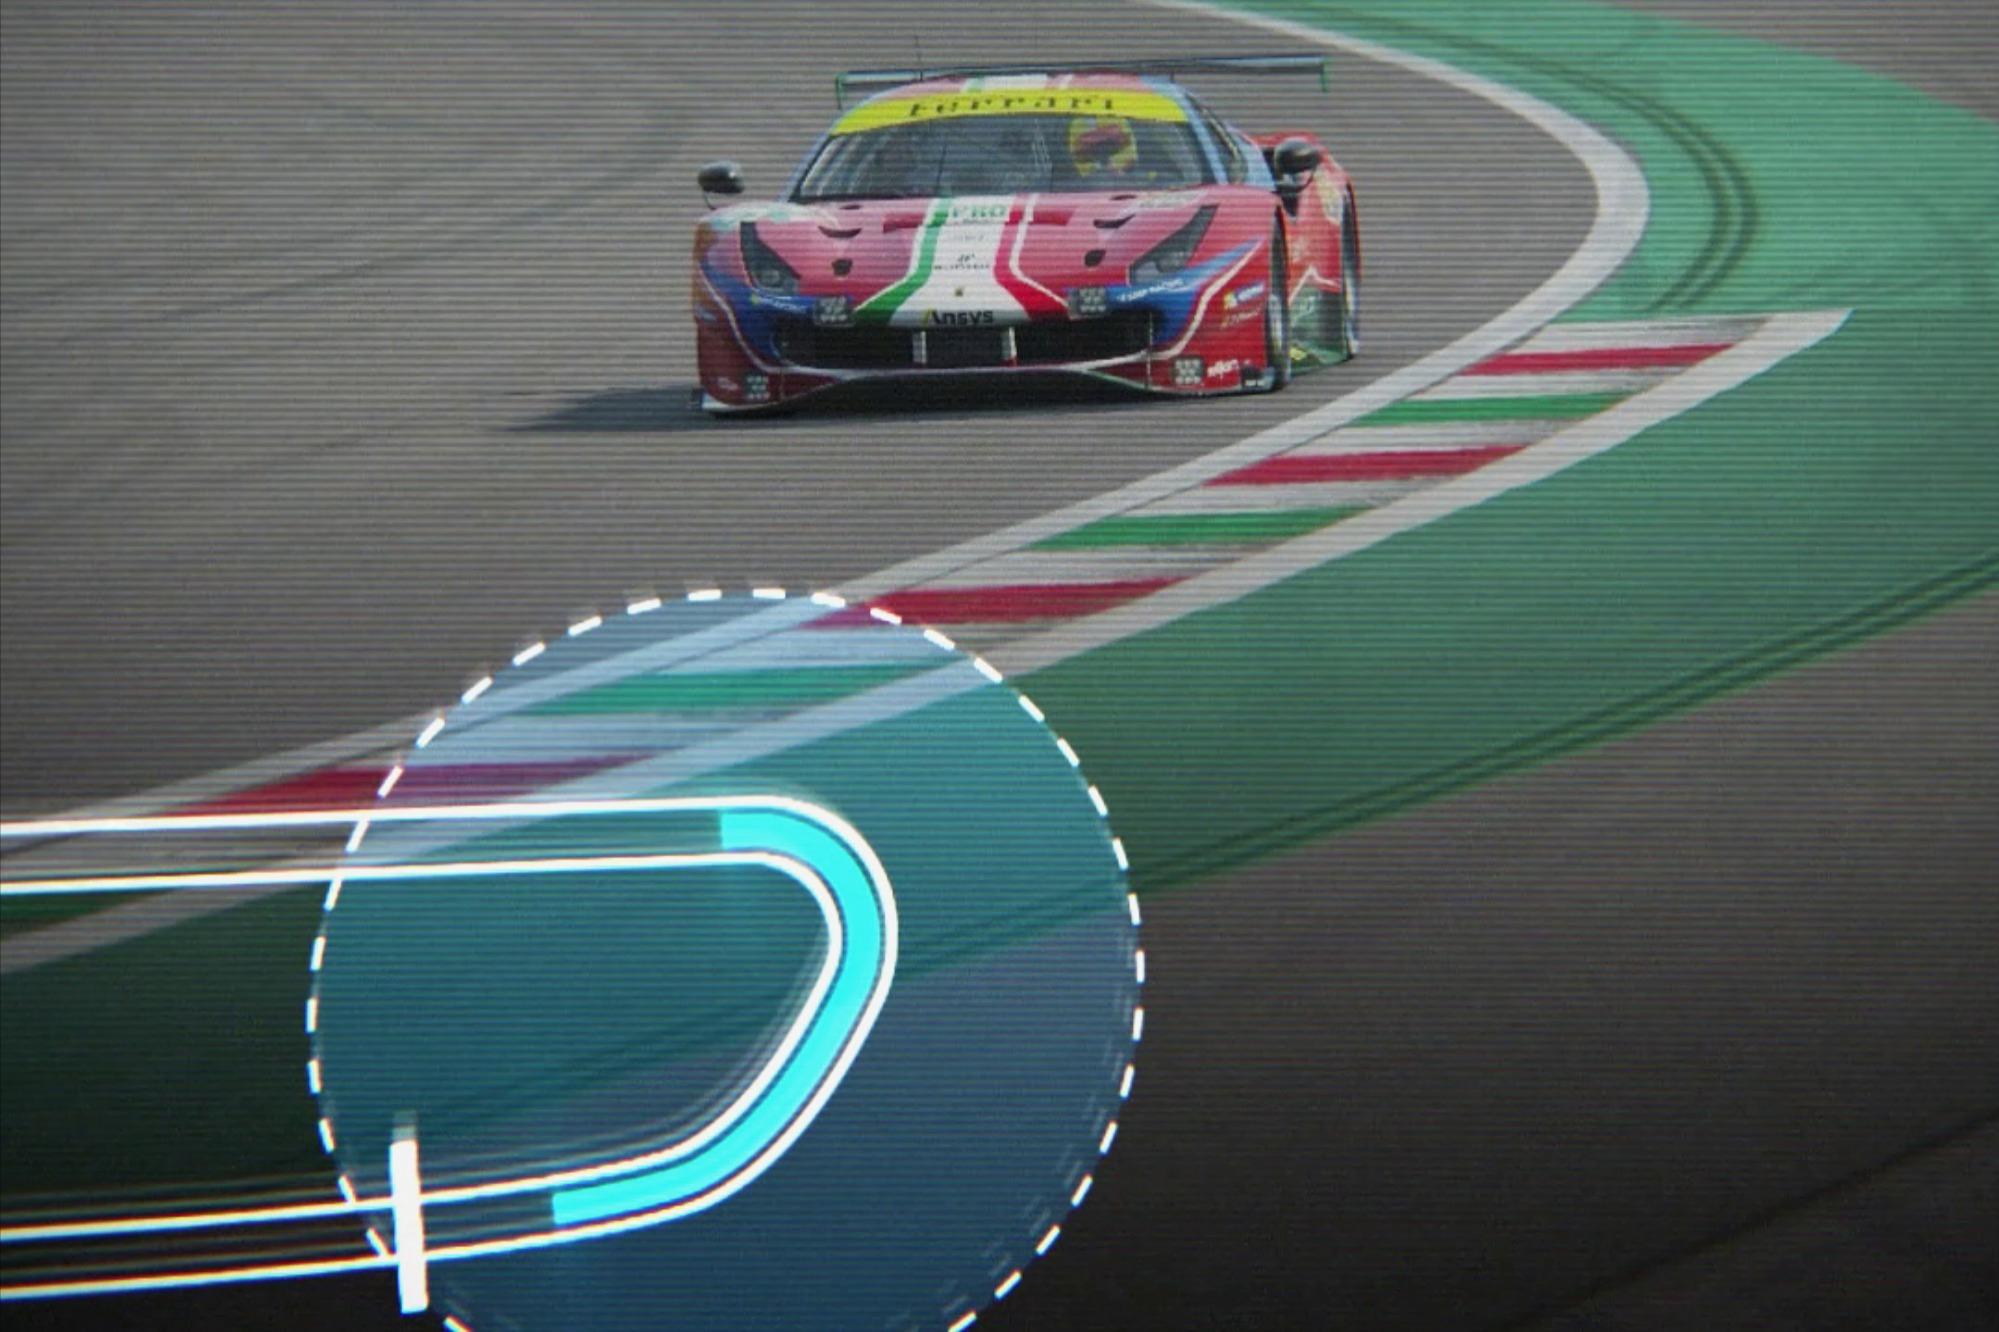 Curva Alboreto yang sebelumya bernama Parabolica, menjadi salah satu tantangan menarik bagi para pembalap di Sirkuit Monza, Italia.